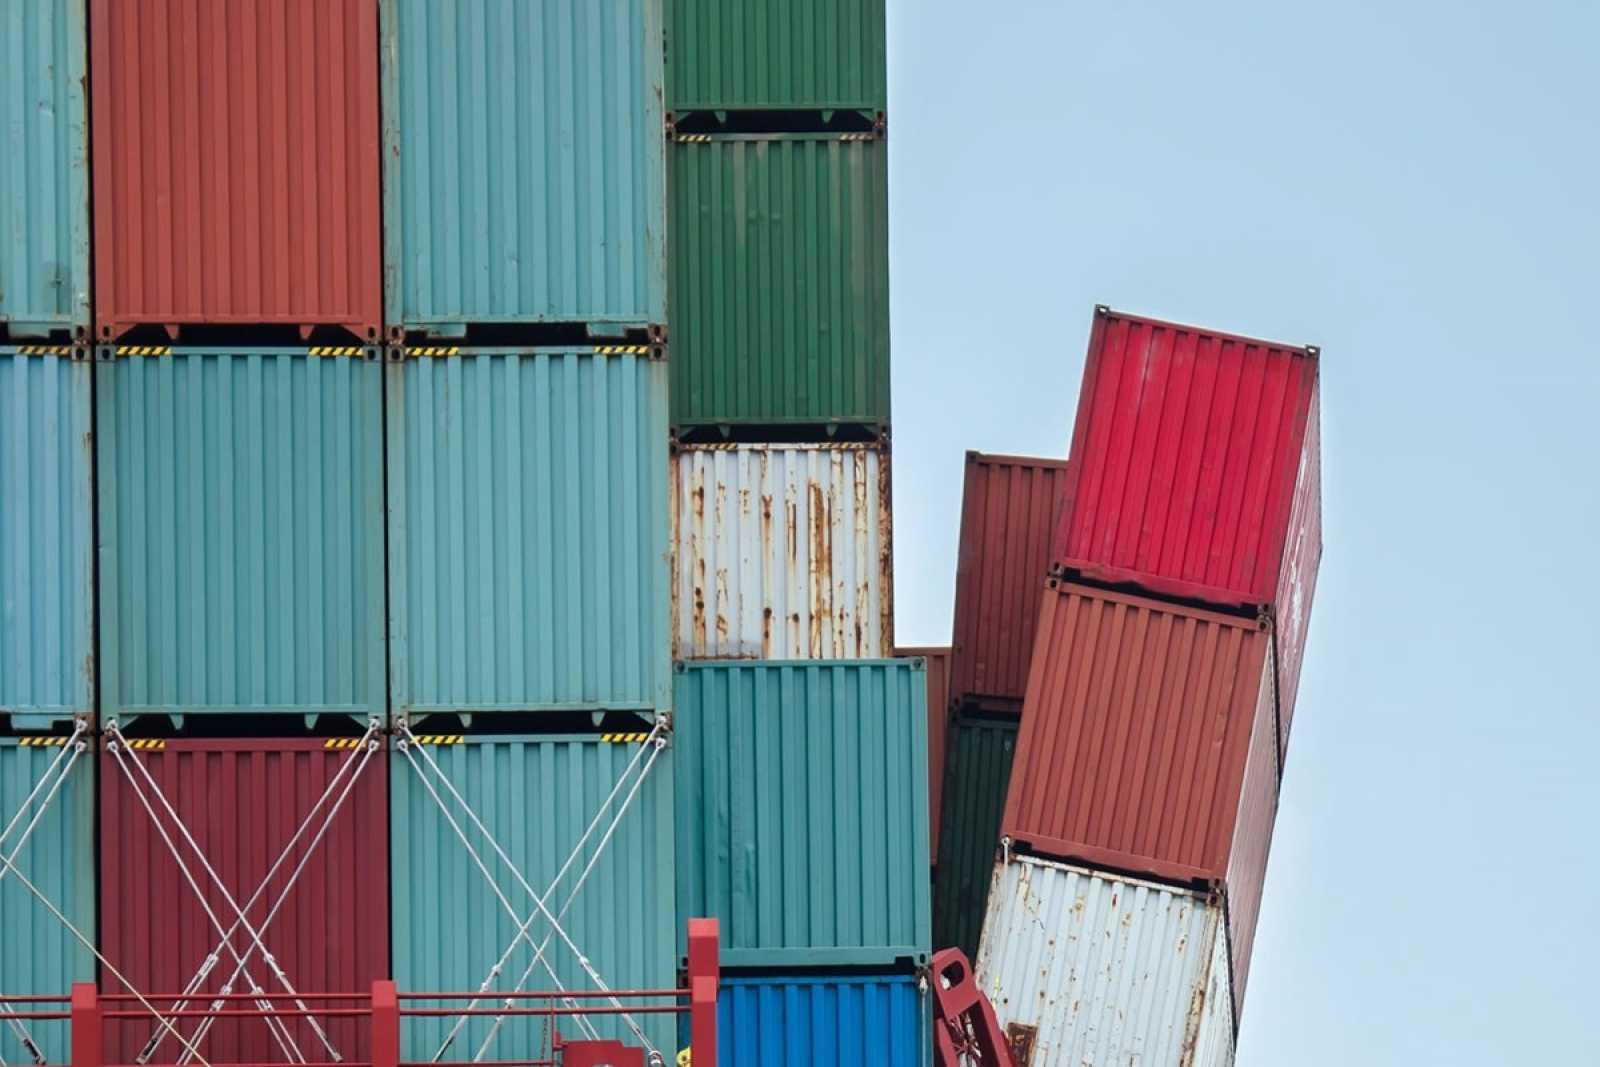 Container tumble